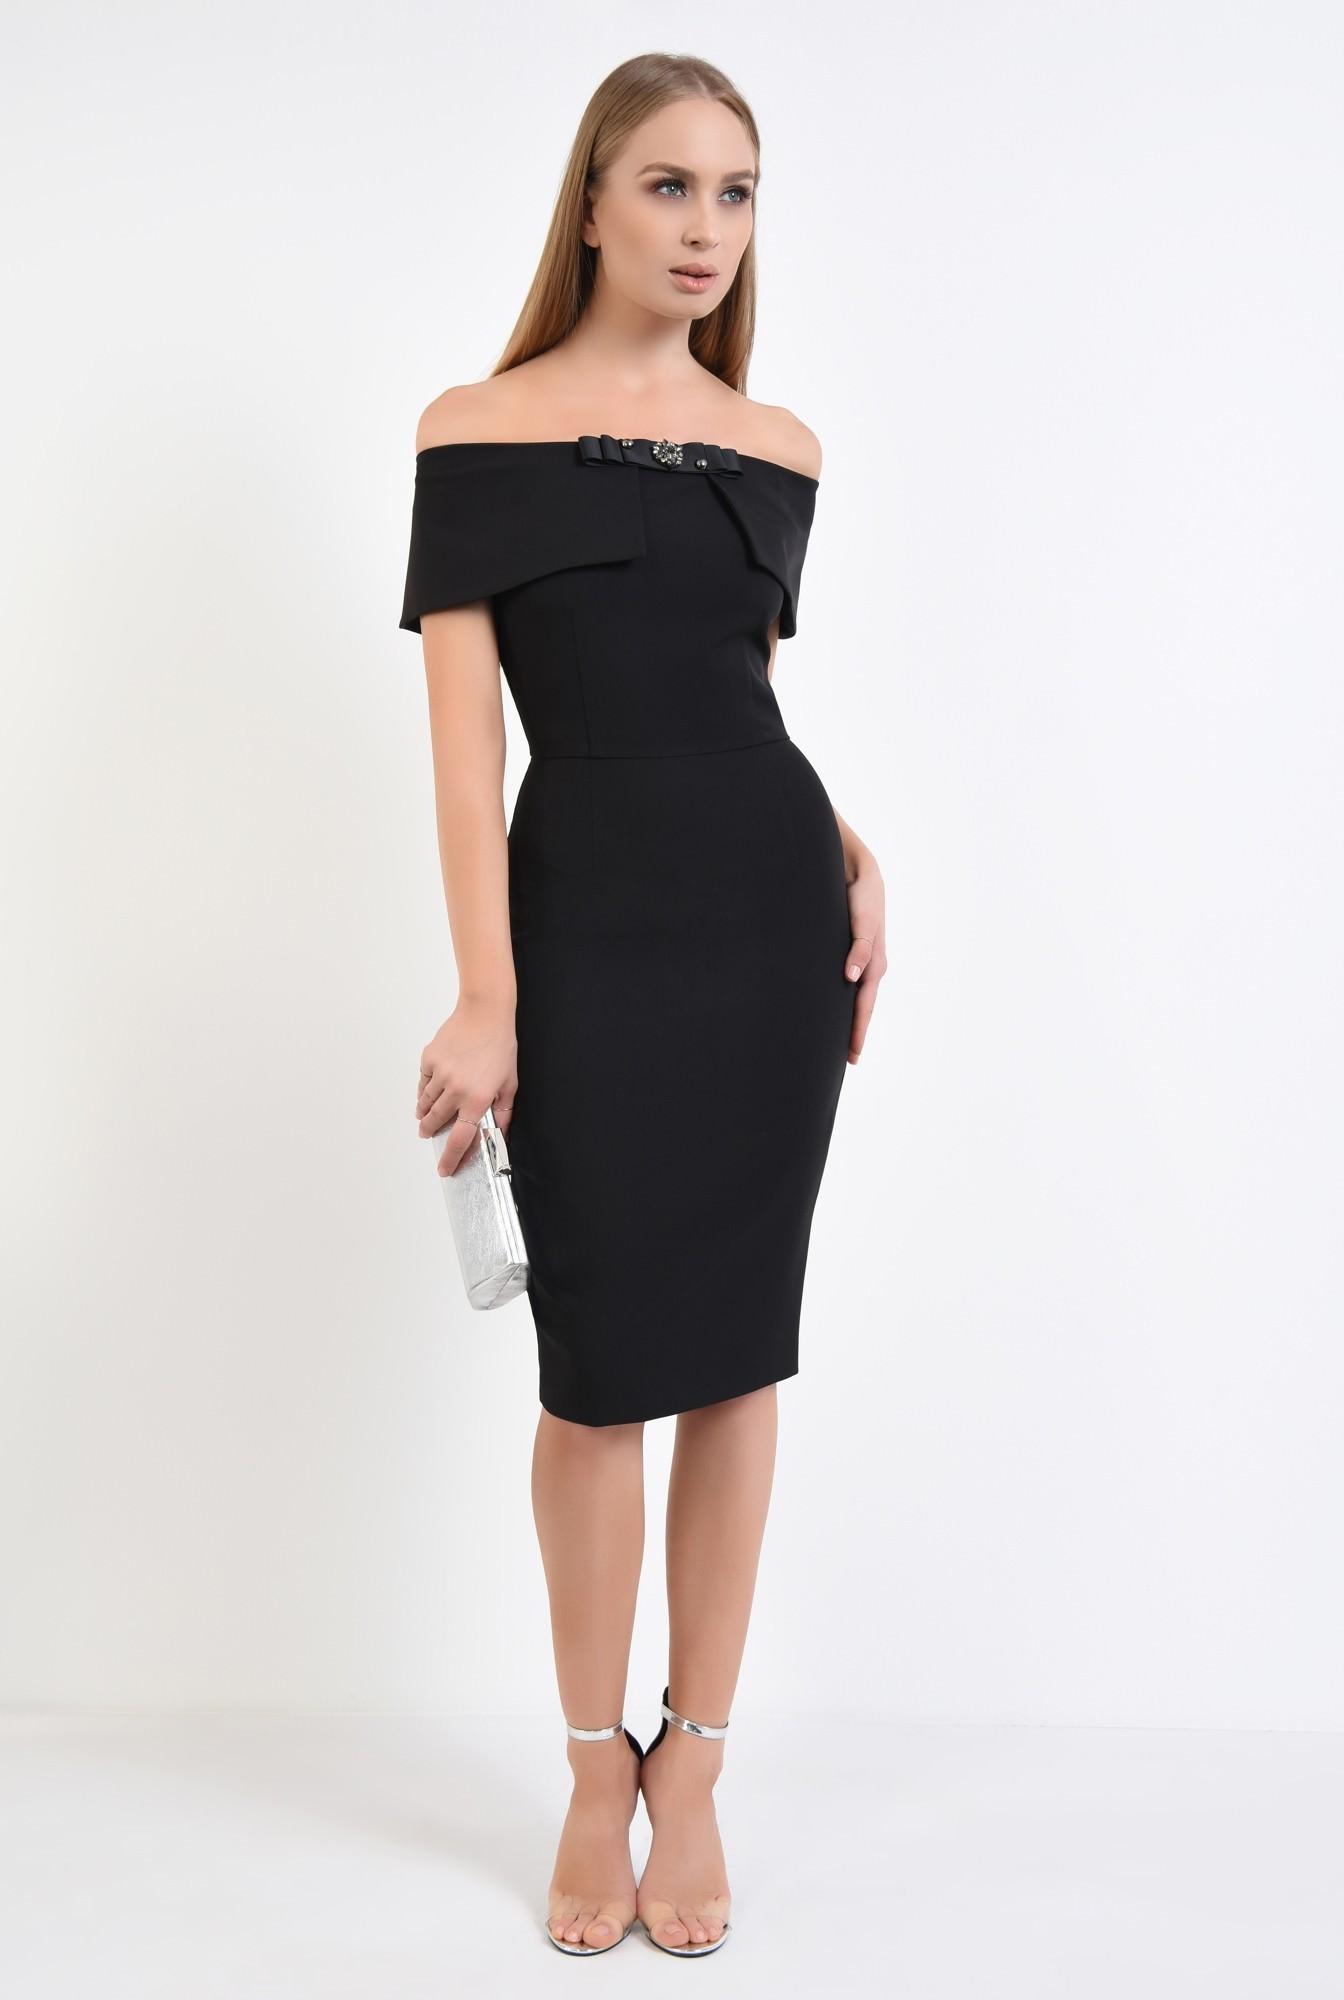 3 - rochie de seara, neagra, conica, cu funda